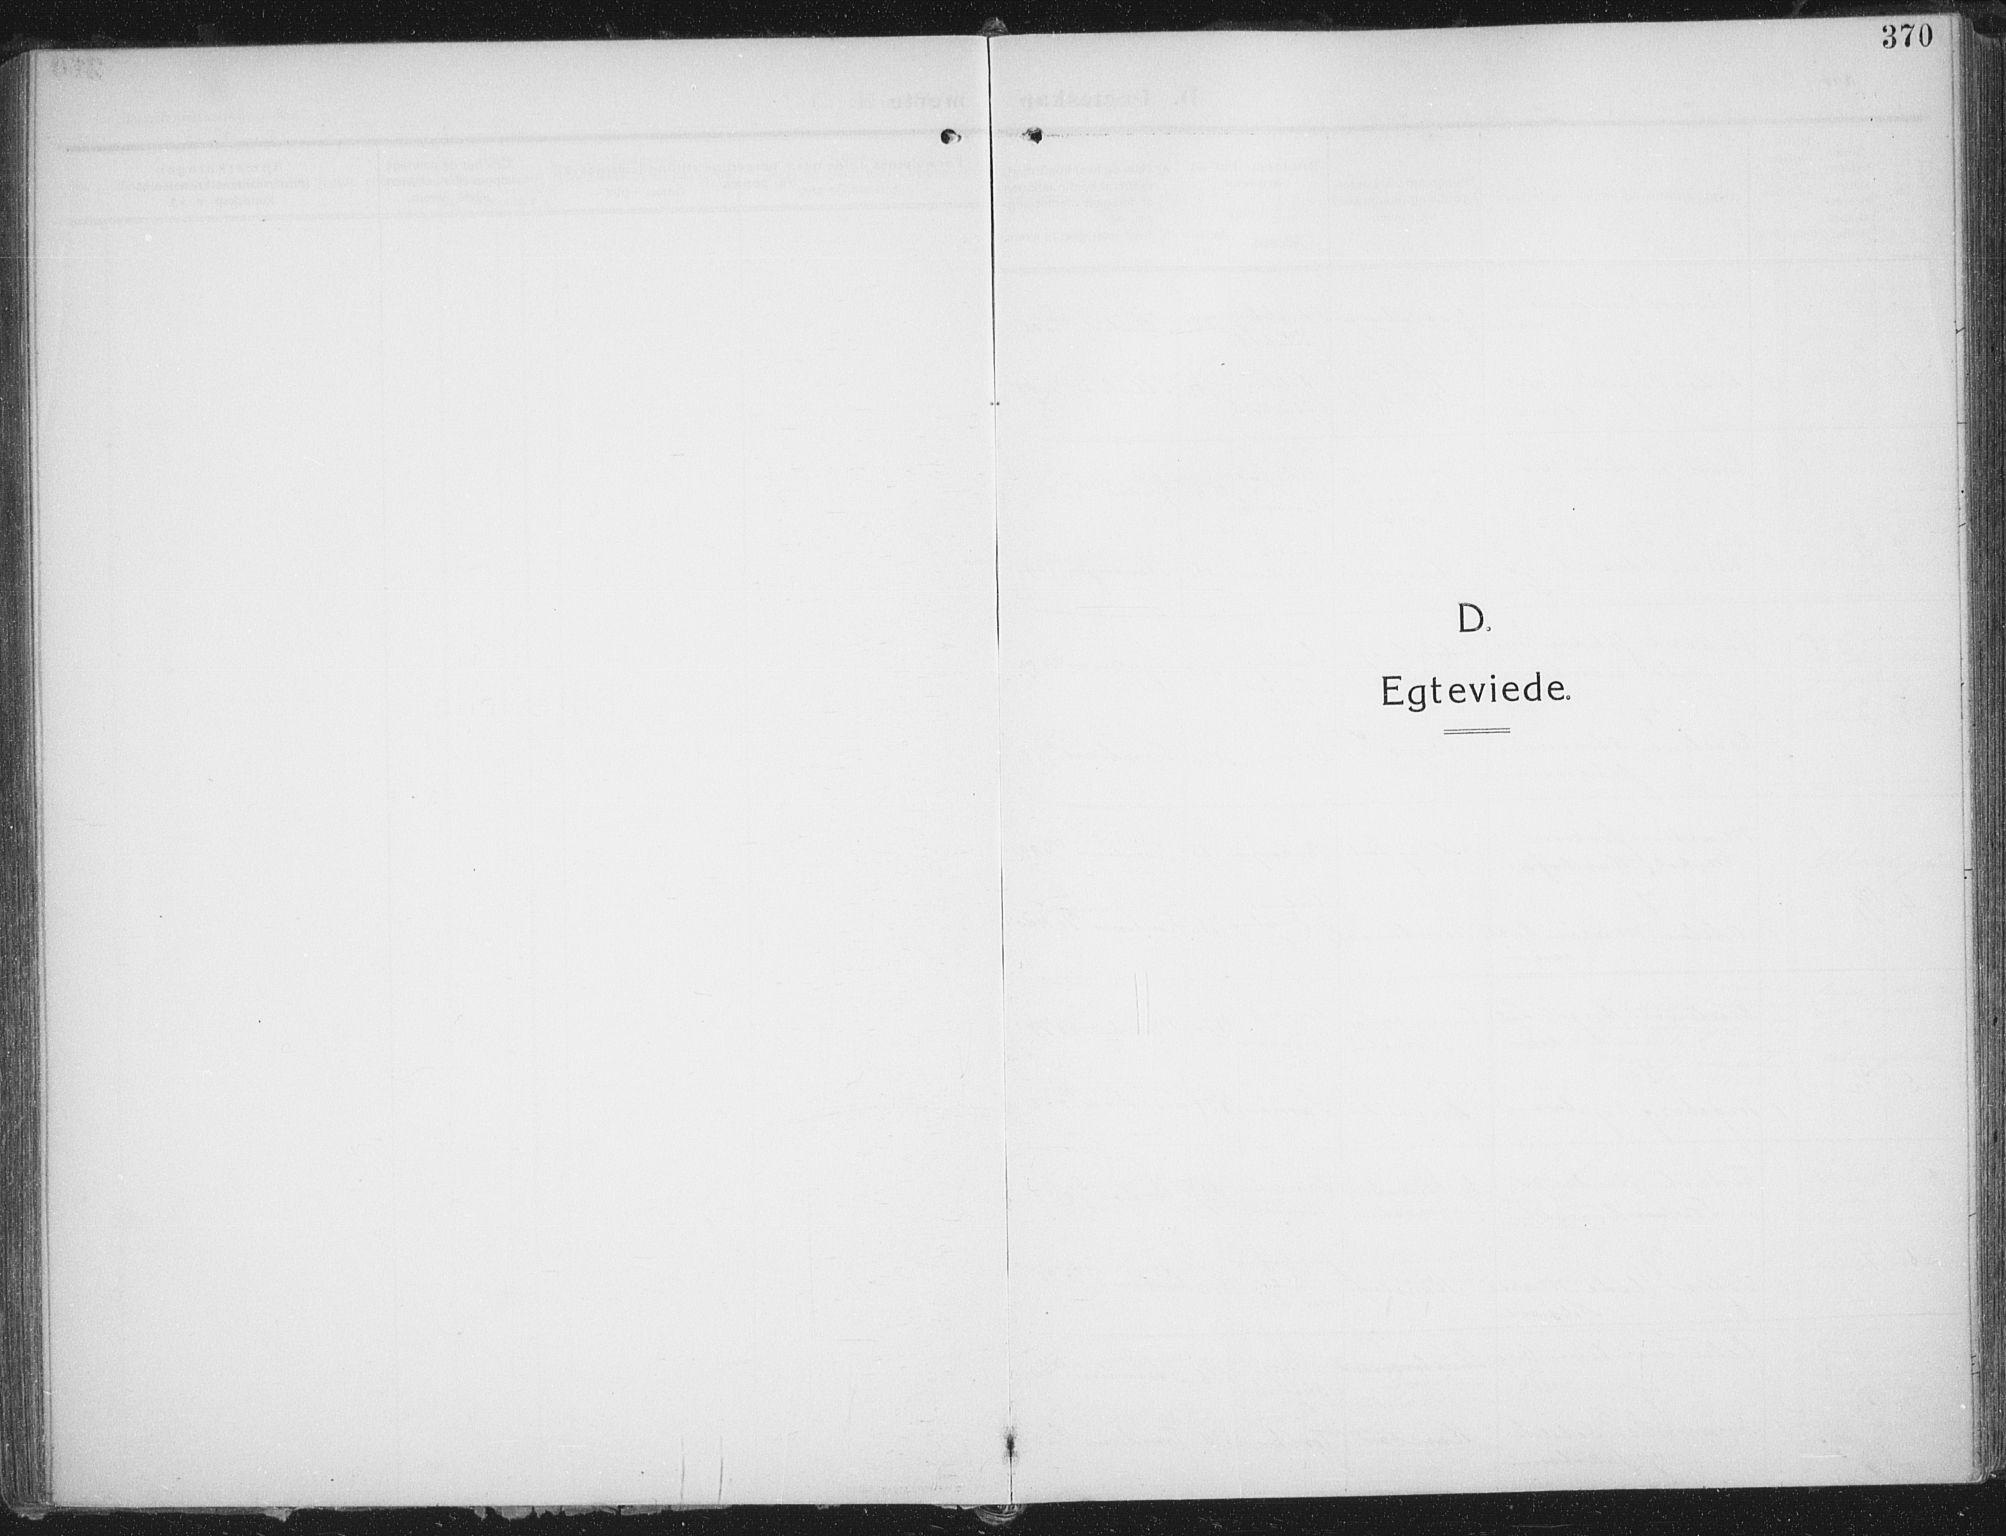 SATØ, Trondenes sokneprestkontor, H/Ha/L0018kirke: Parish register (official) no. 18, 1909-1918, p. 370